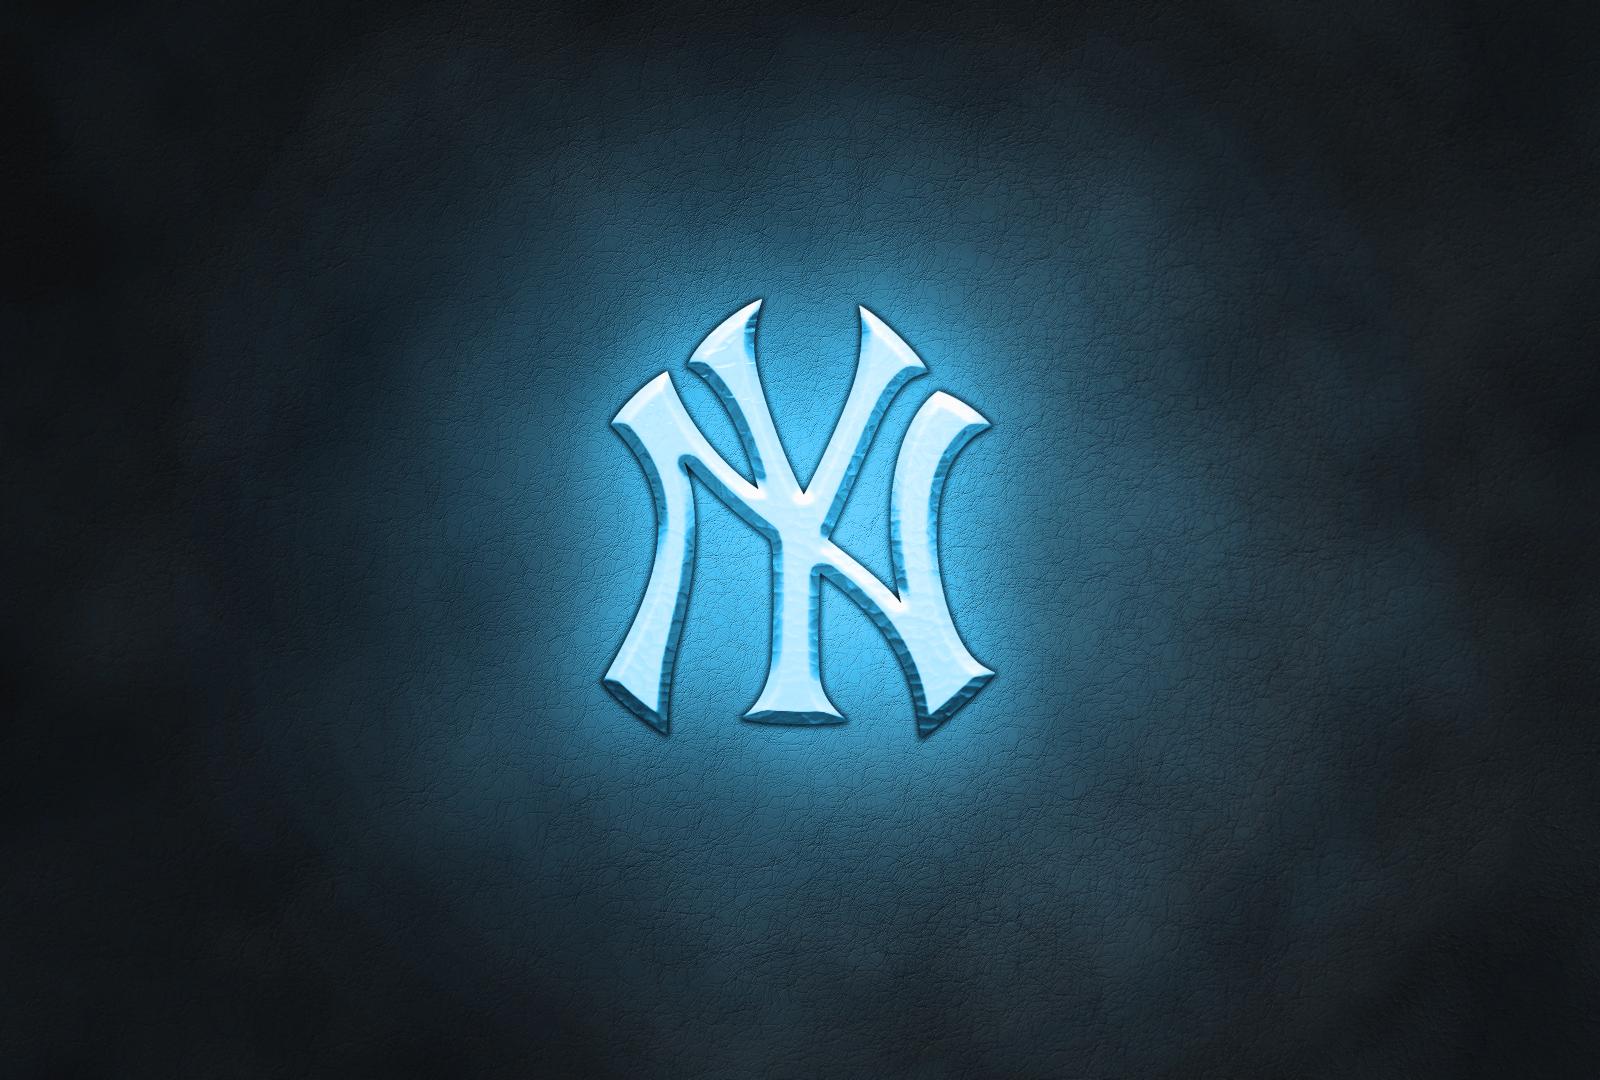 Yankees Wallpaper Logo 1600x1080